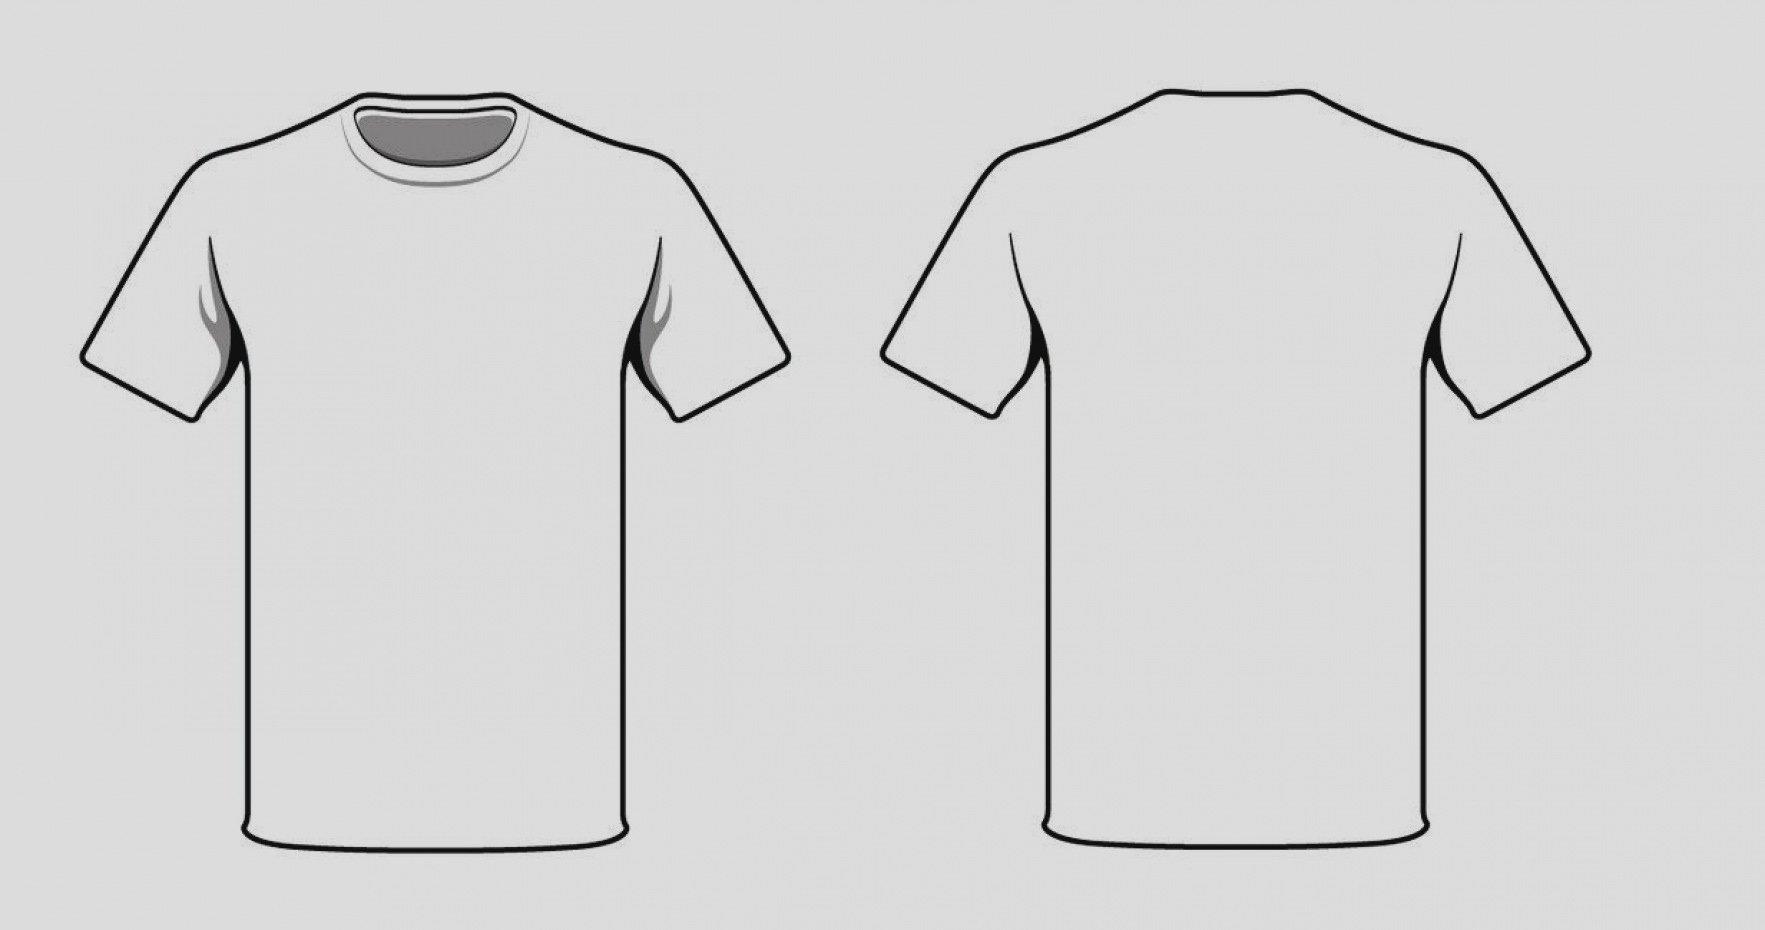 T Shirt Photoshop Template Luxury Mens T Shirt Templates Cb Ebcd F B Fdccf X X Spectacular T